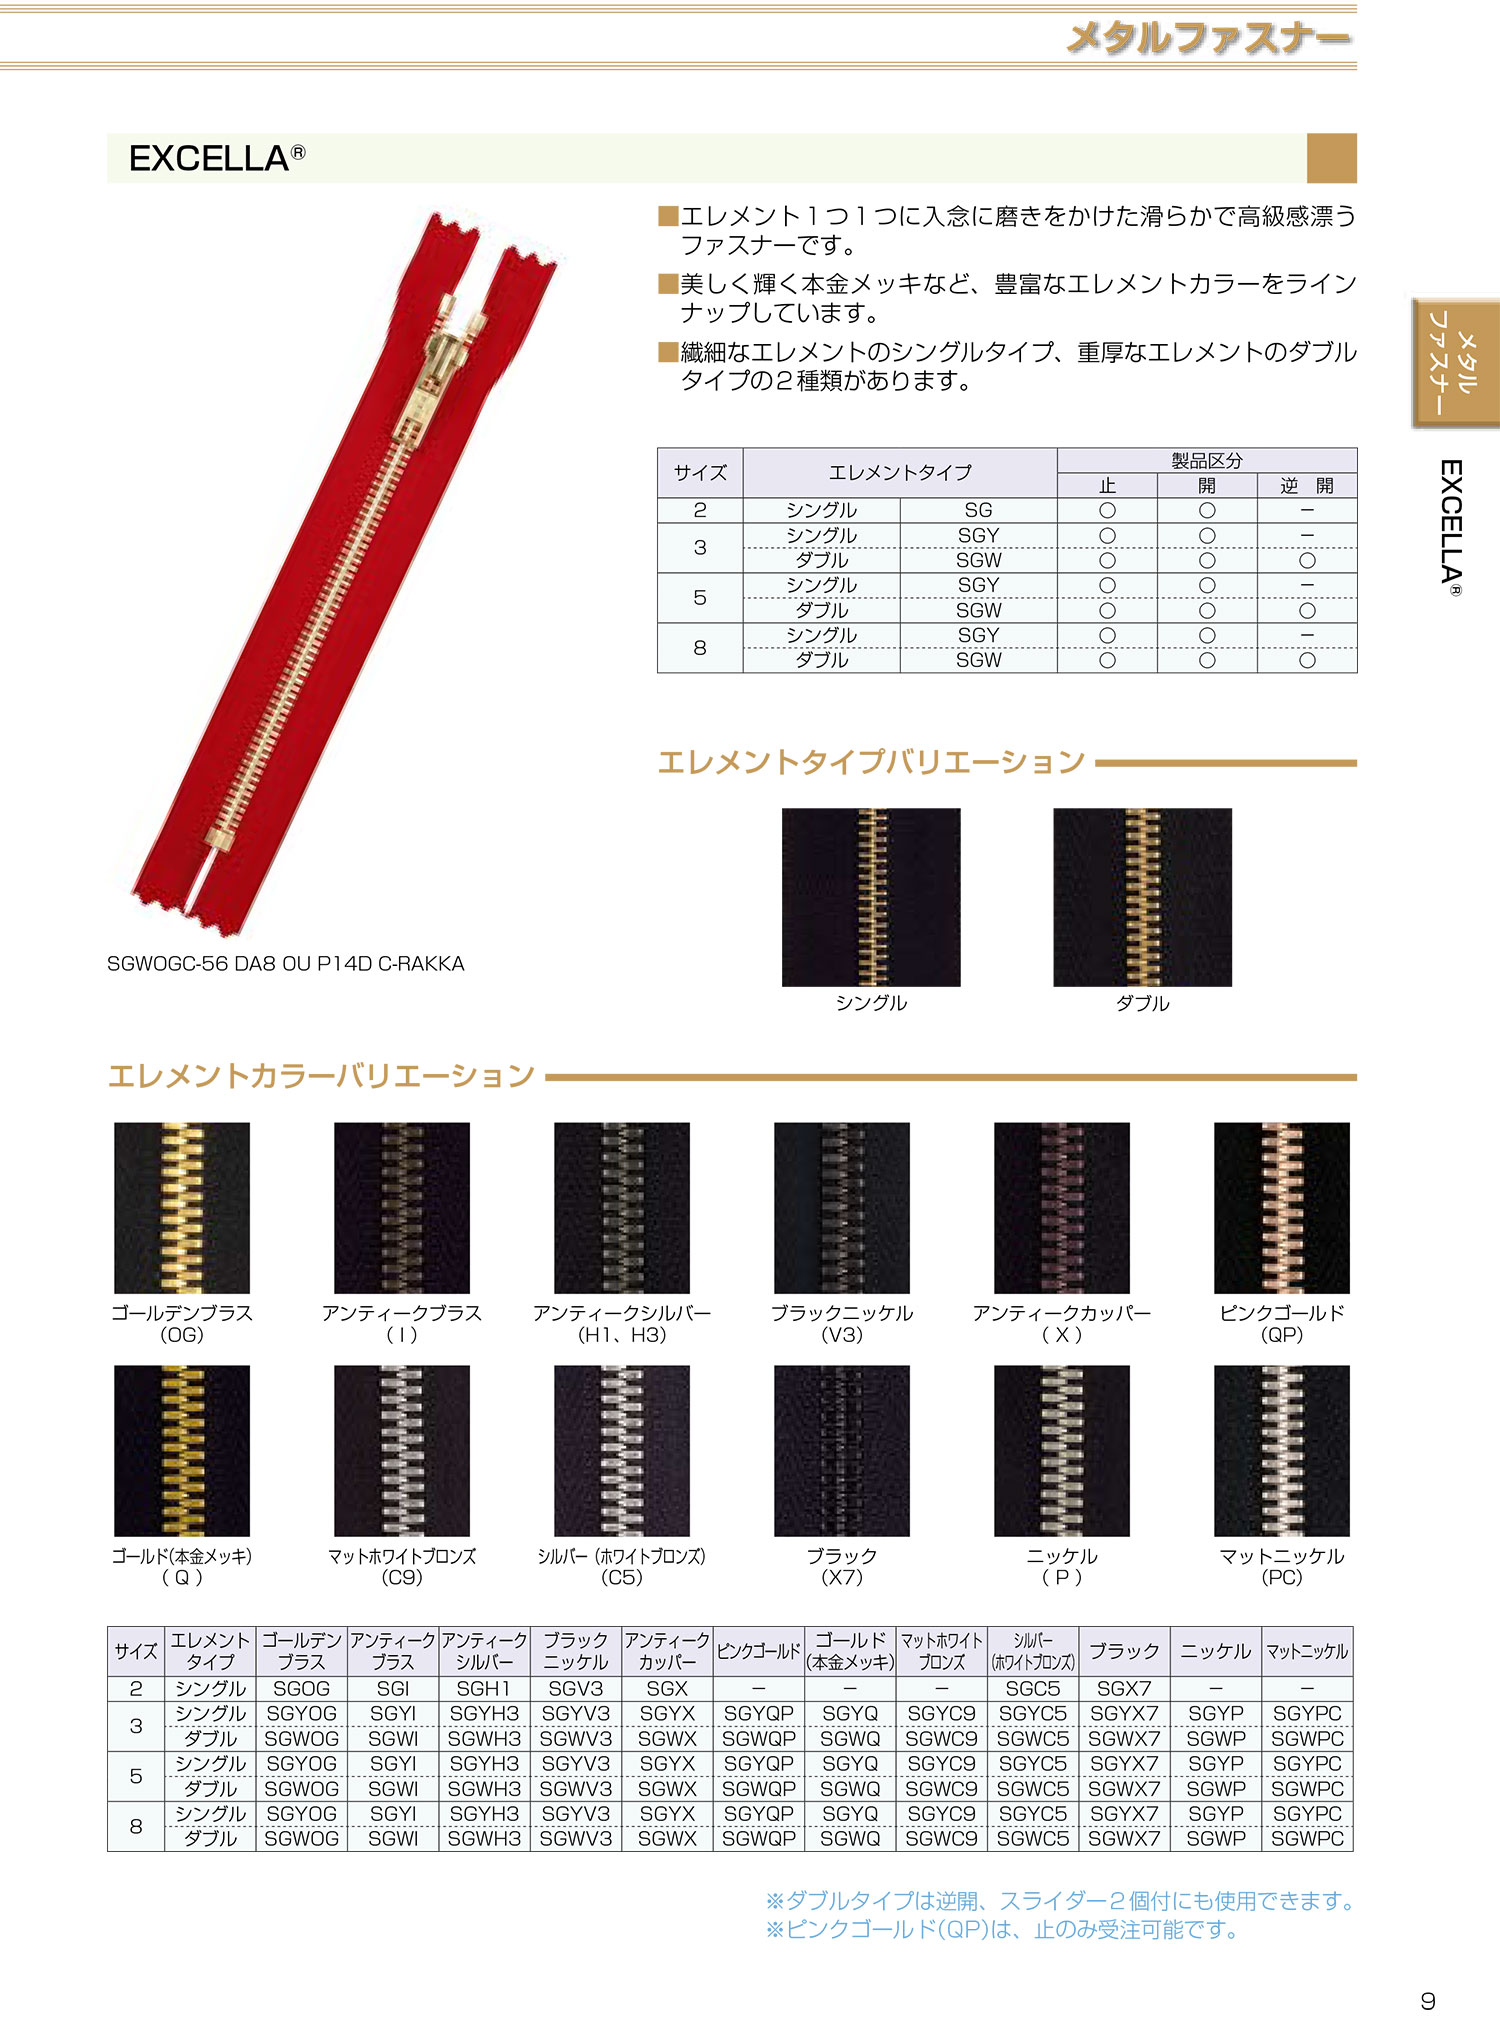 3SGYPOR エクセラ 3サイズ ニッケル オープン シングル[ファスナー] YKK/オークラ商事 - ApparelX アパレル資材卸通販